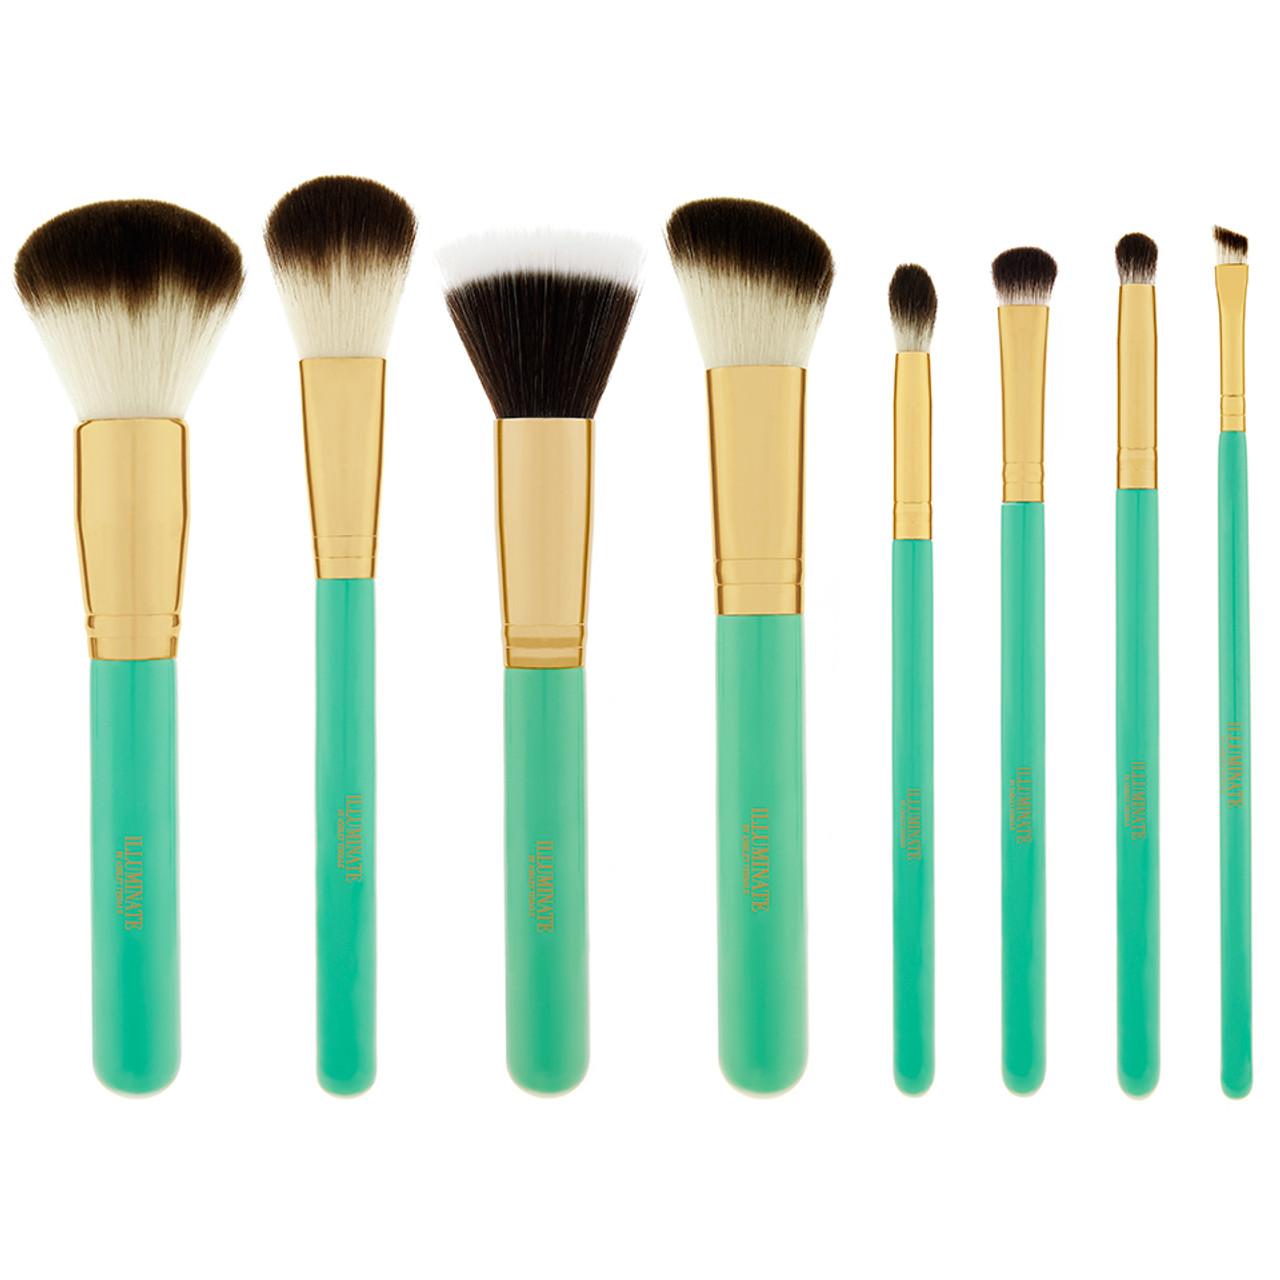 bh cosmetics illuminate by ashley tisdale brush set. Black Bedroom Furniture Sets. Home Design Ideas